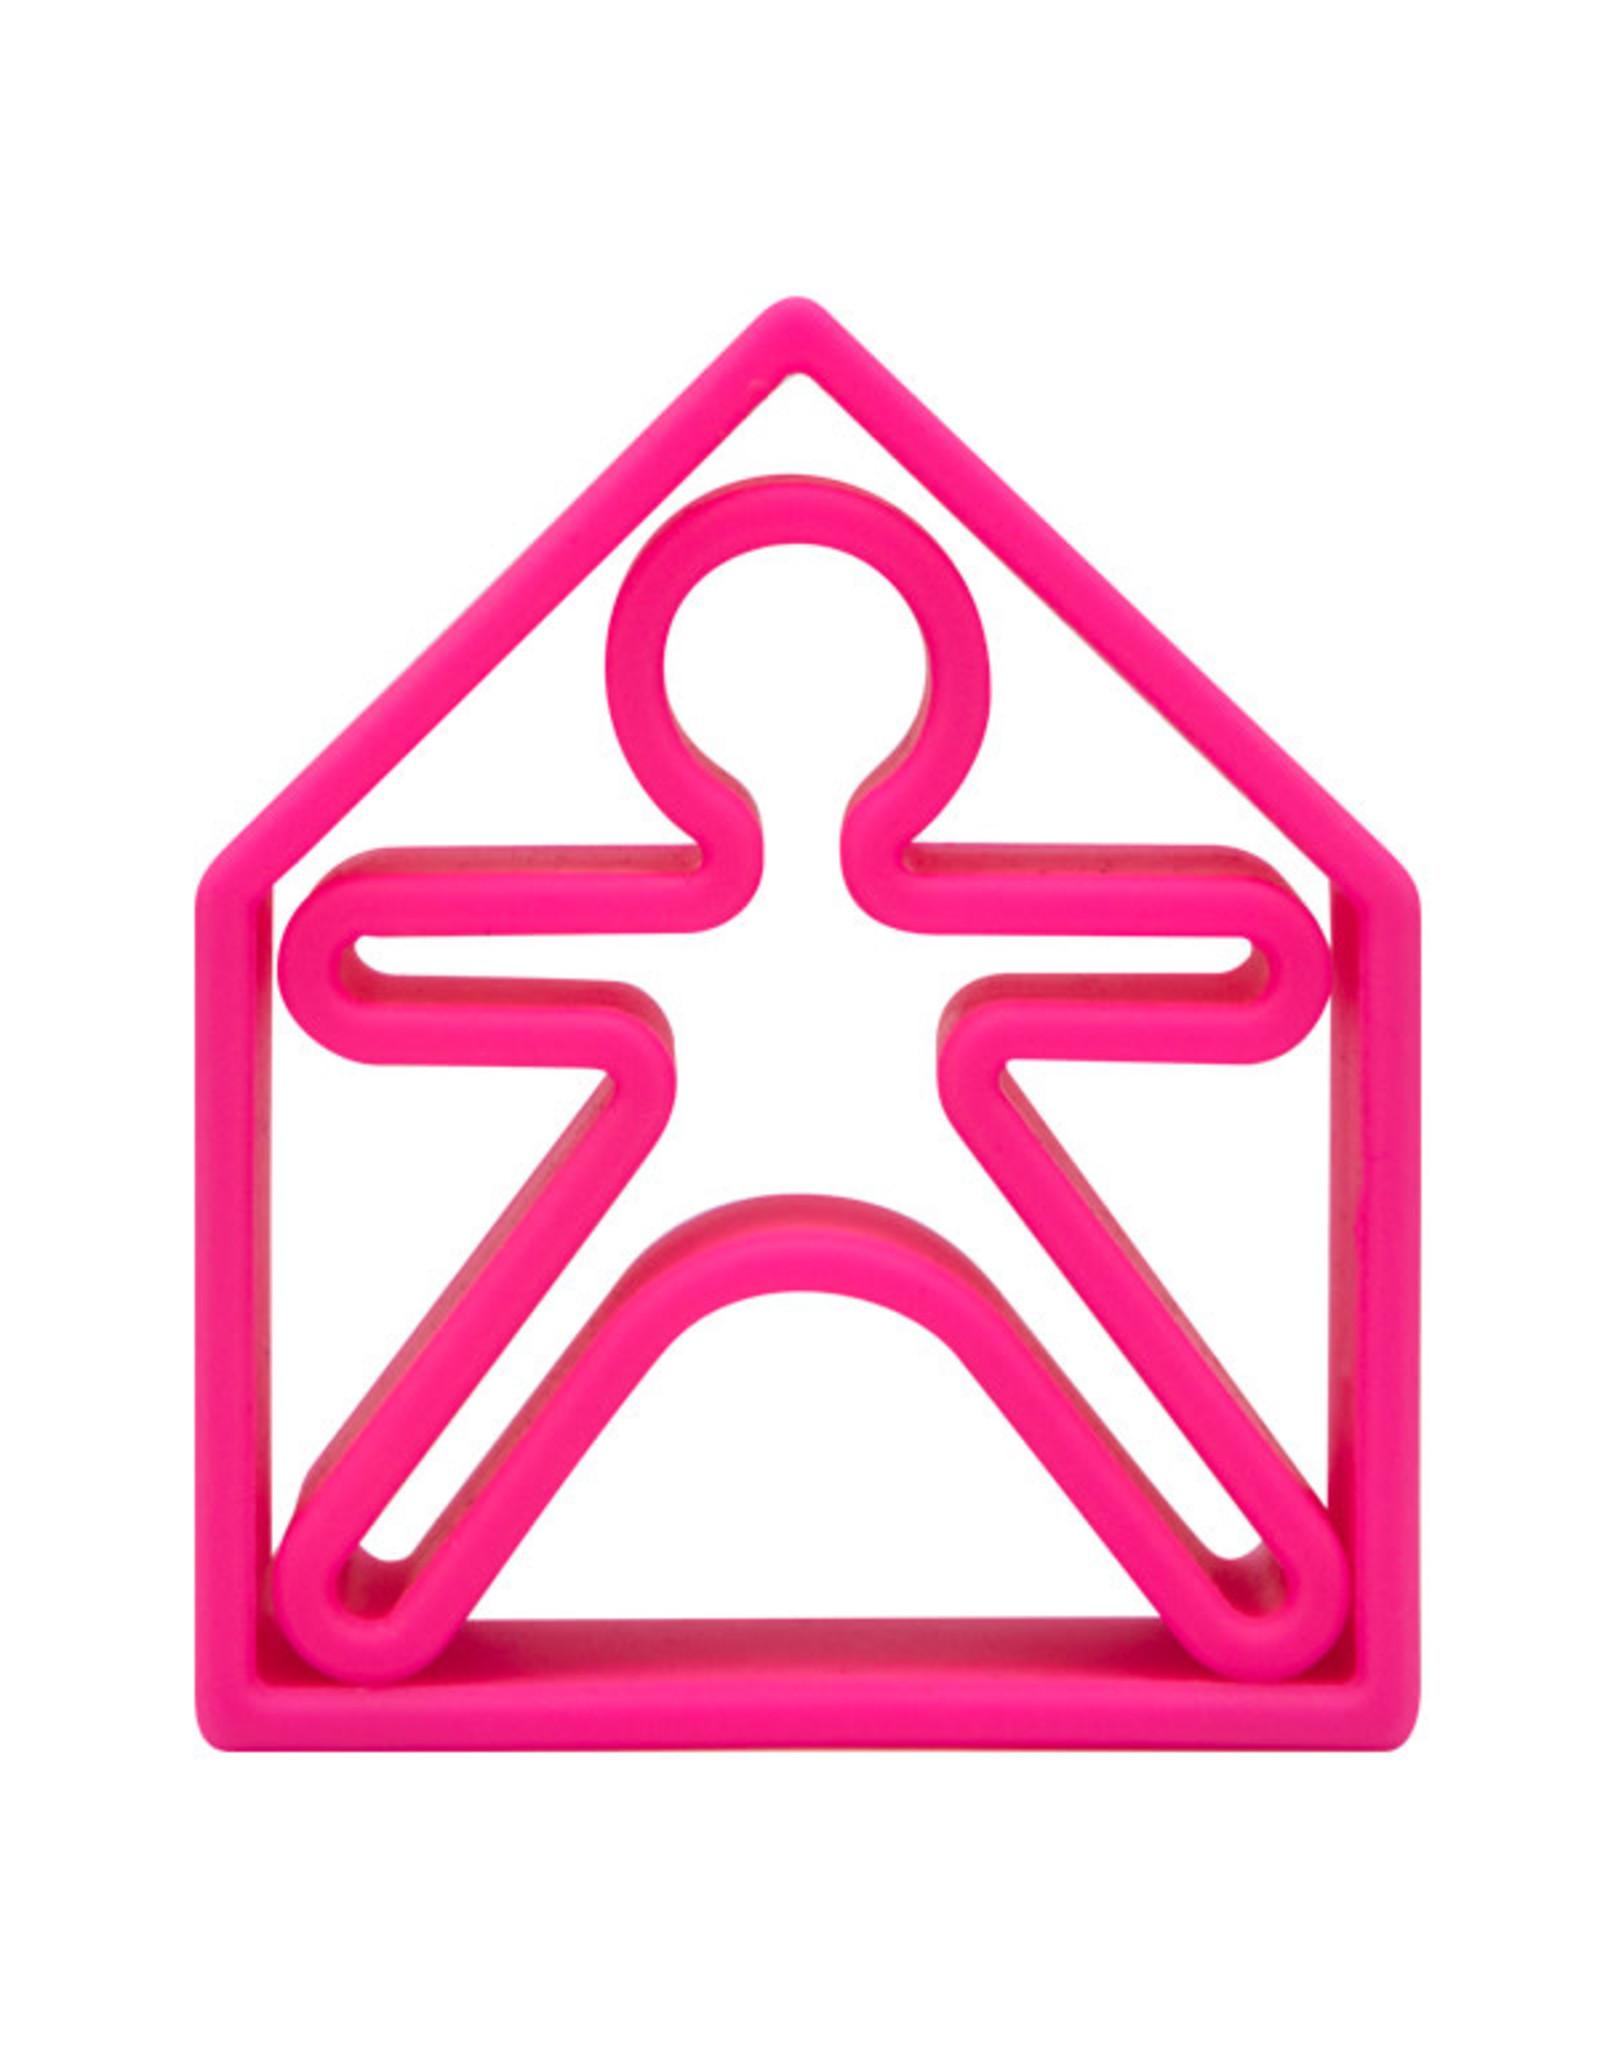 Dena Dena, 1 Kid & 1 House Neon Pink